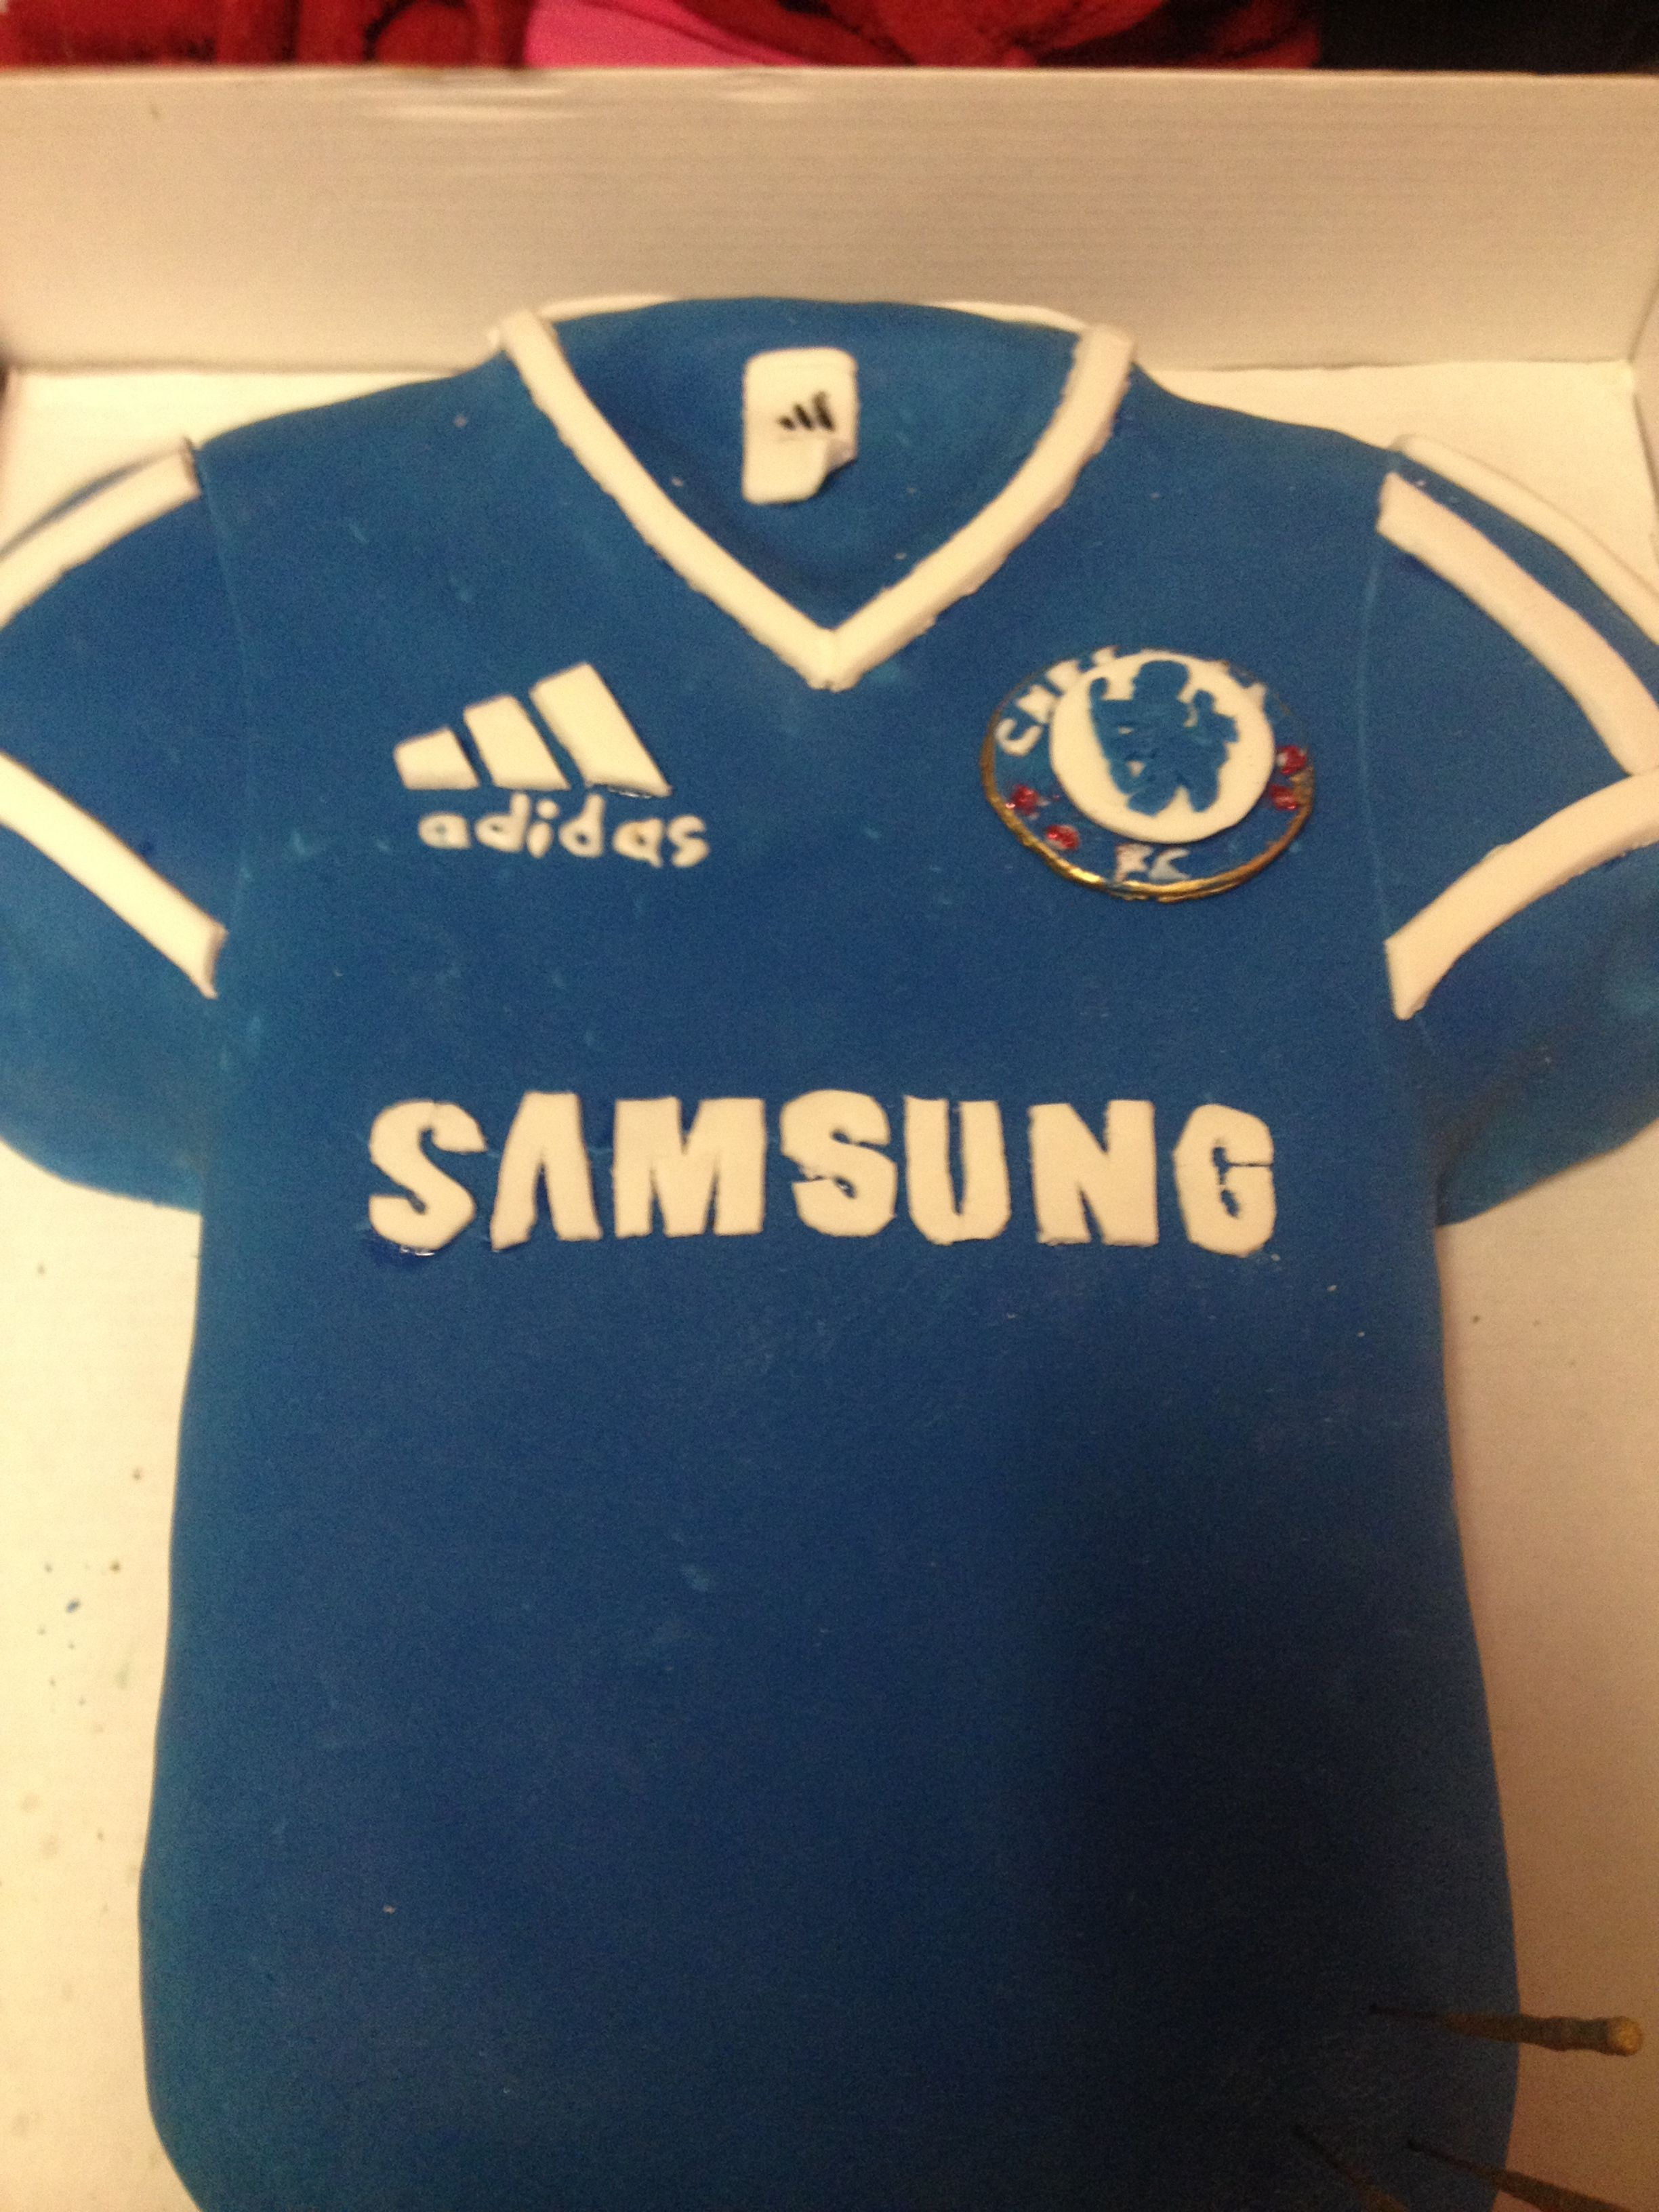 premium selection 08ddd 412cd Chelsea football shirt cake (current season)  